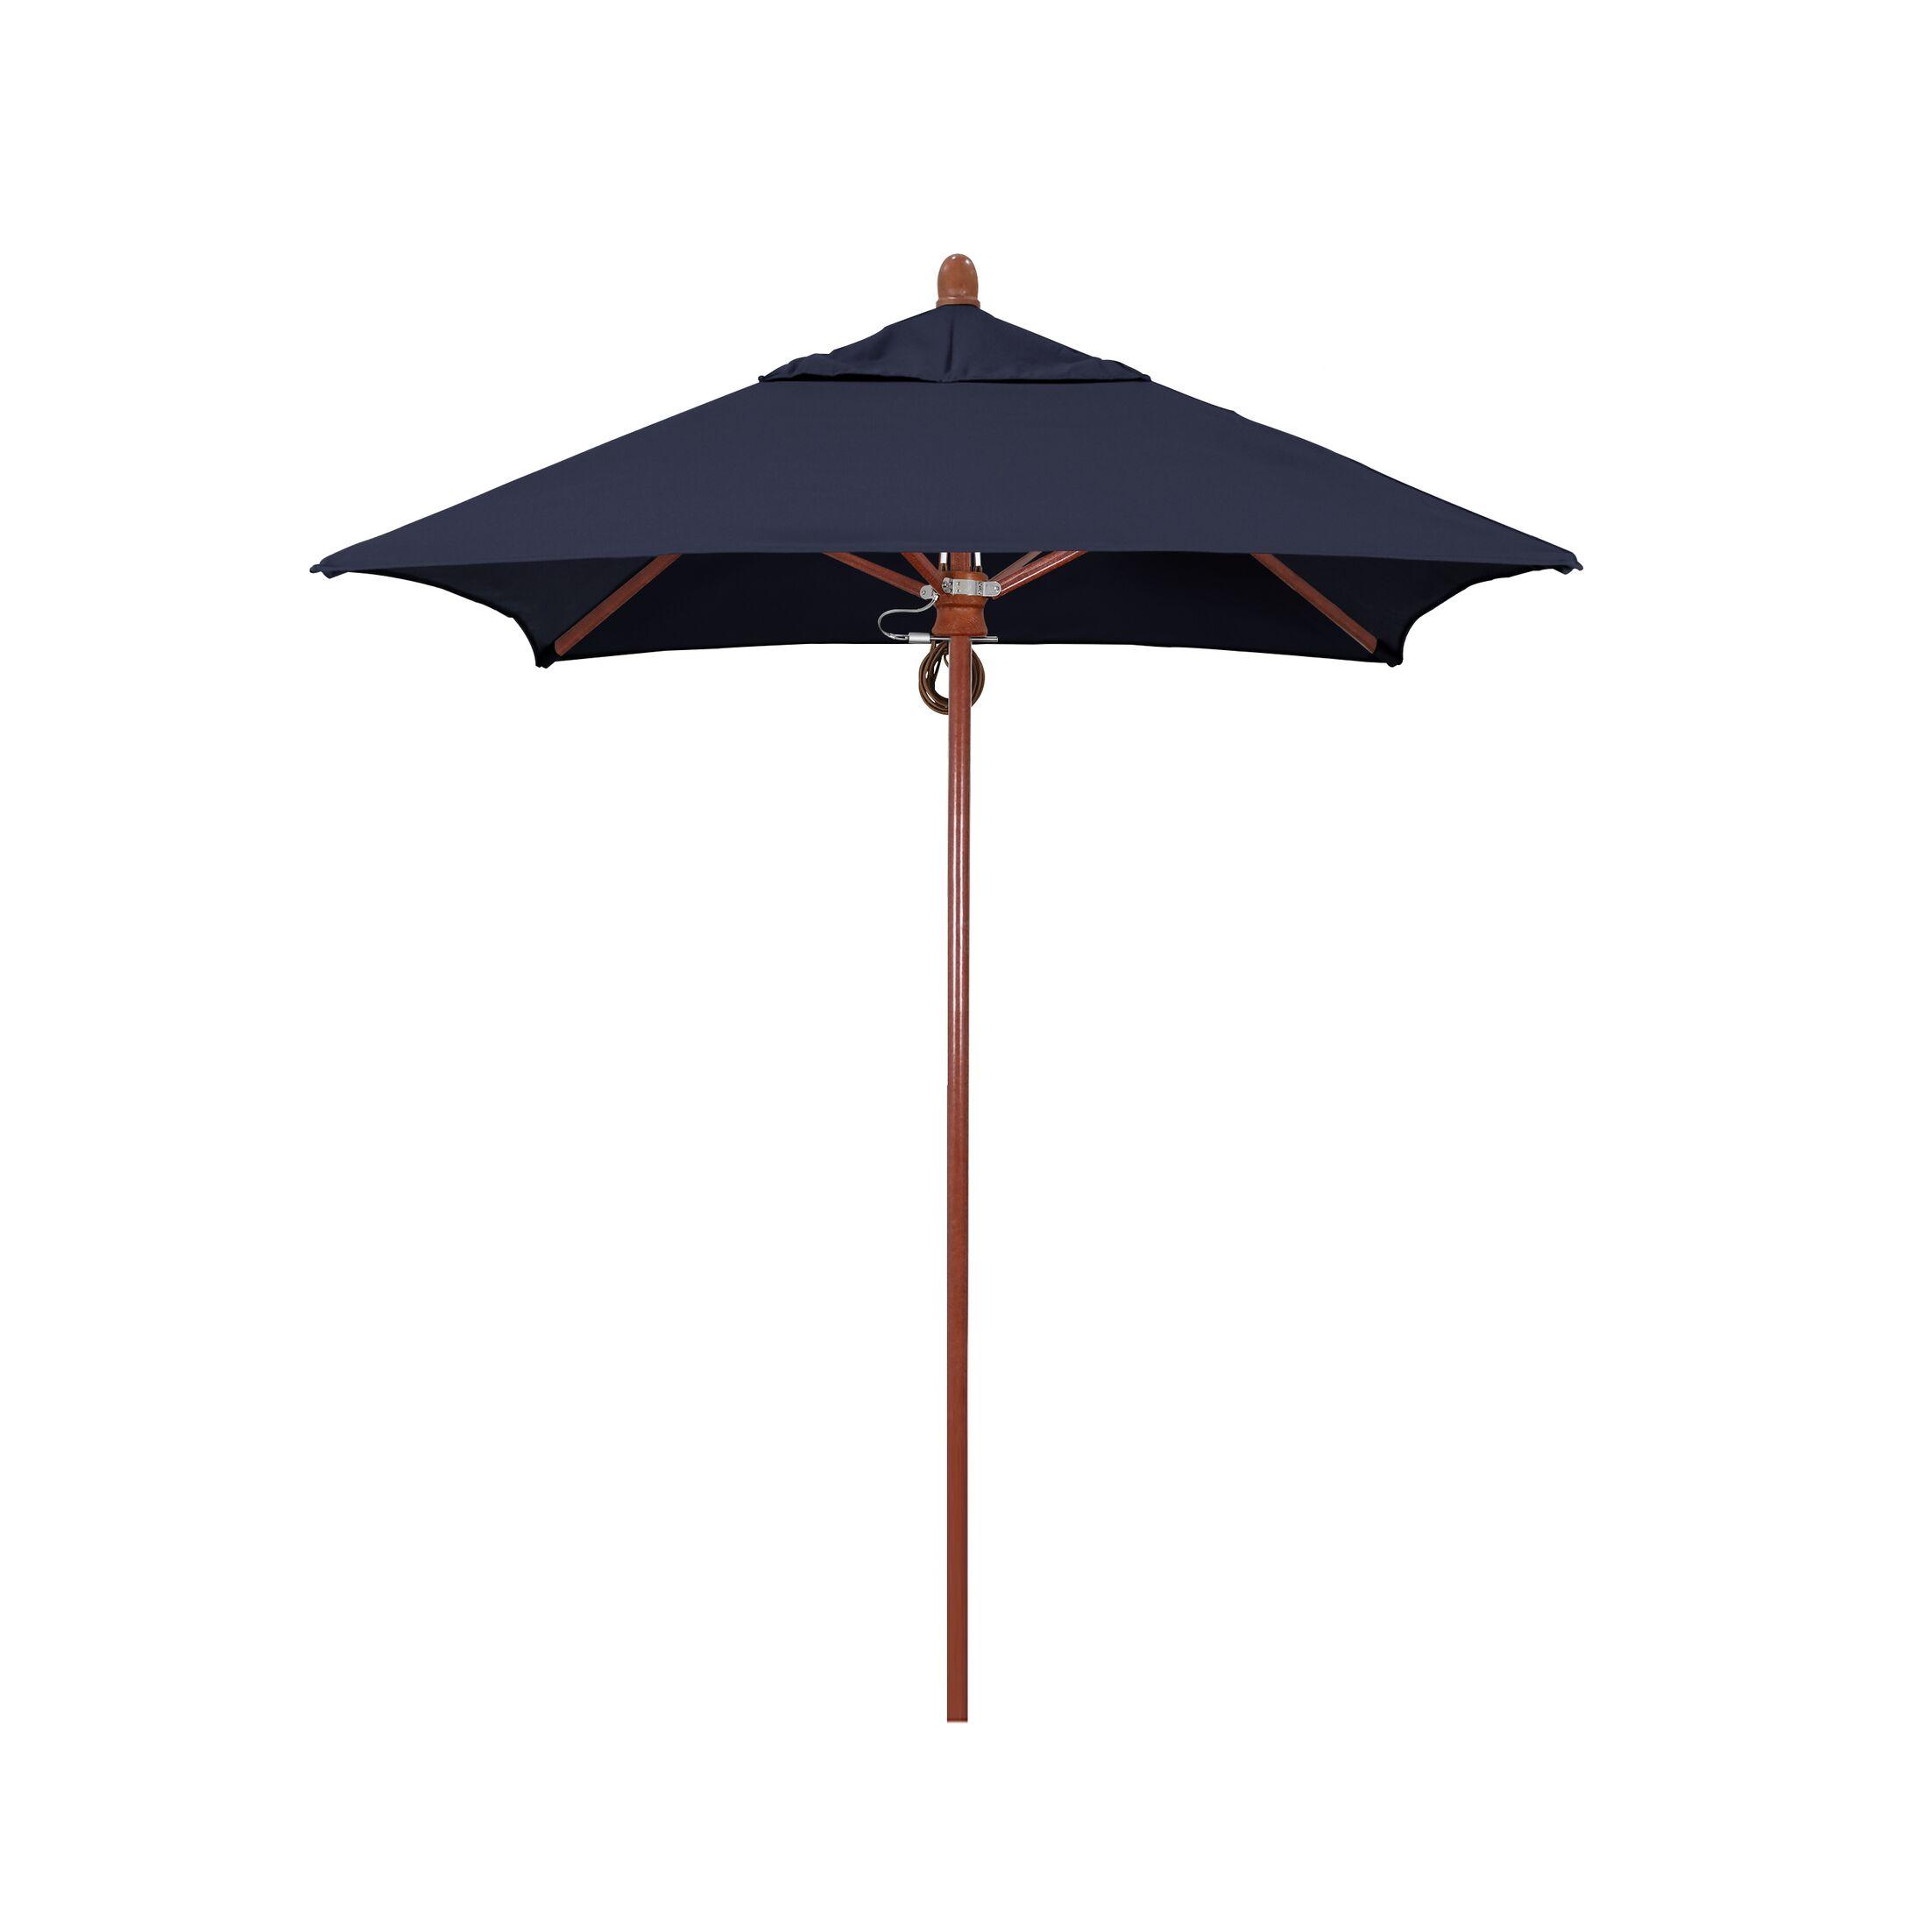 Sierra Series Patio 6' Market Umbrella Fabric Color: Navy, Frame Color: Red Oak